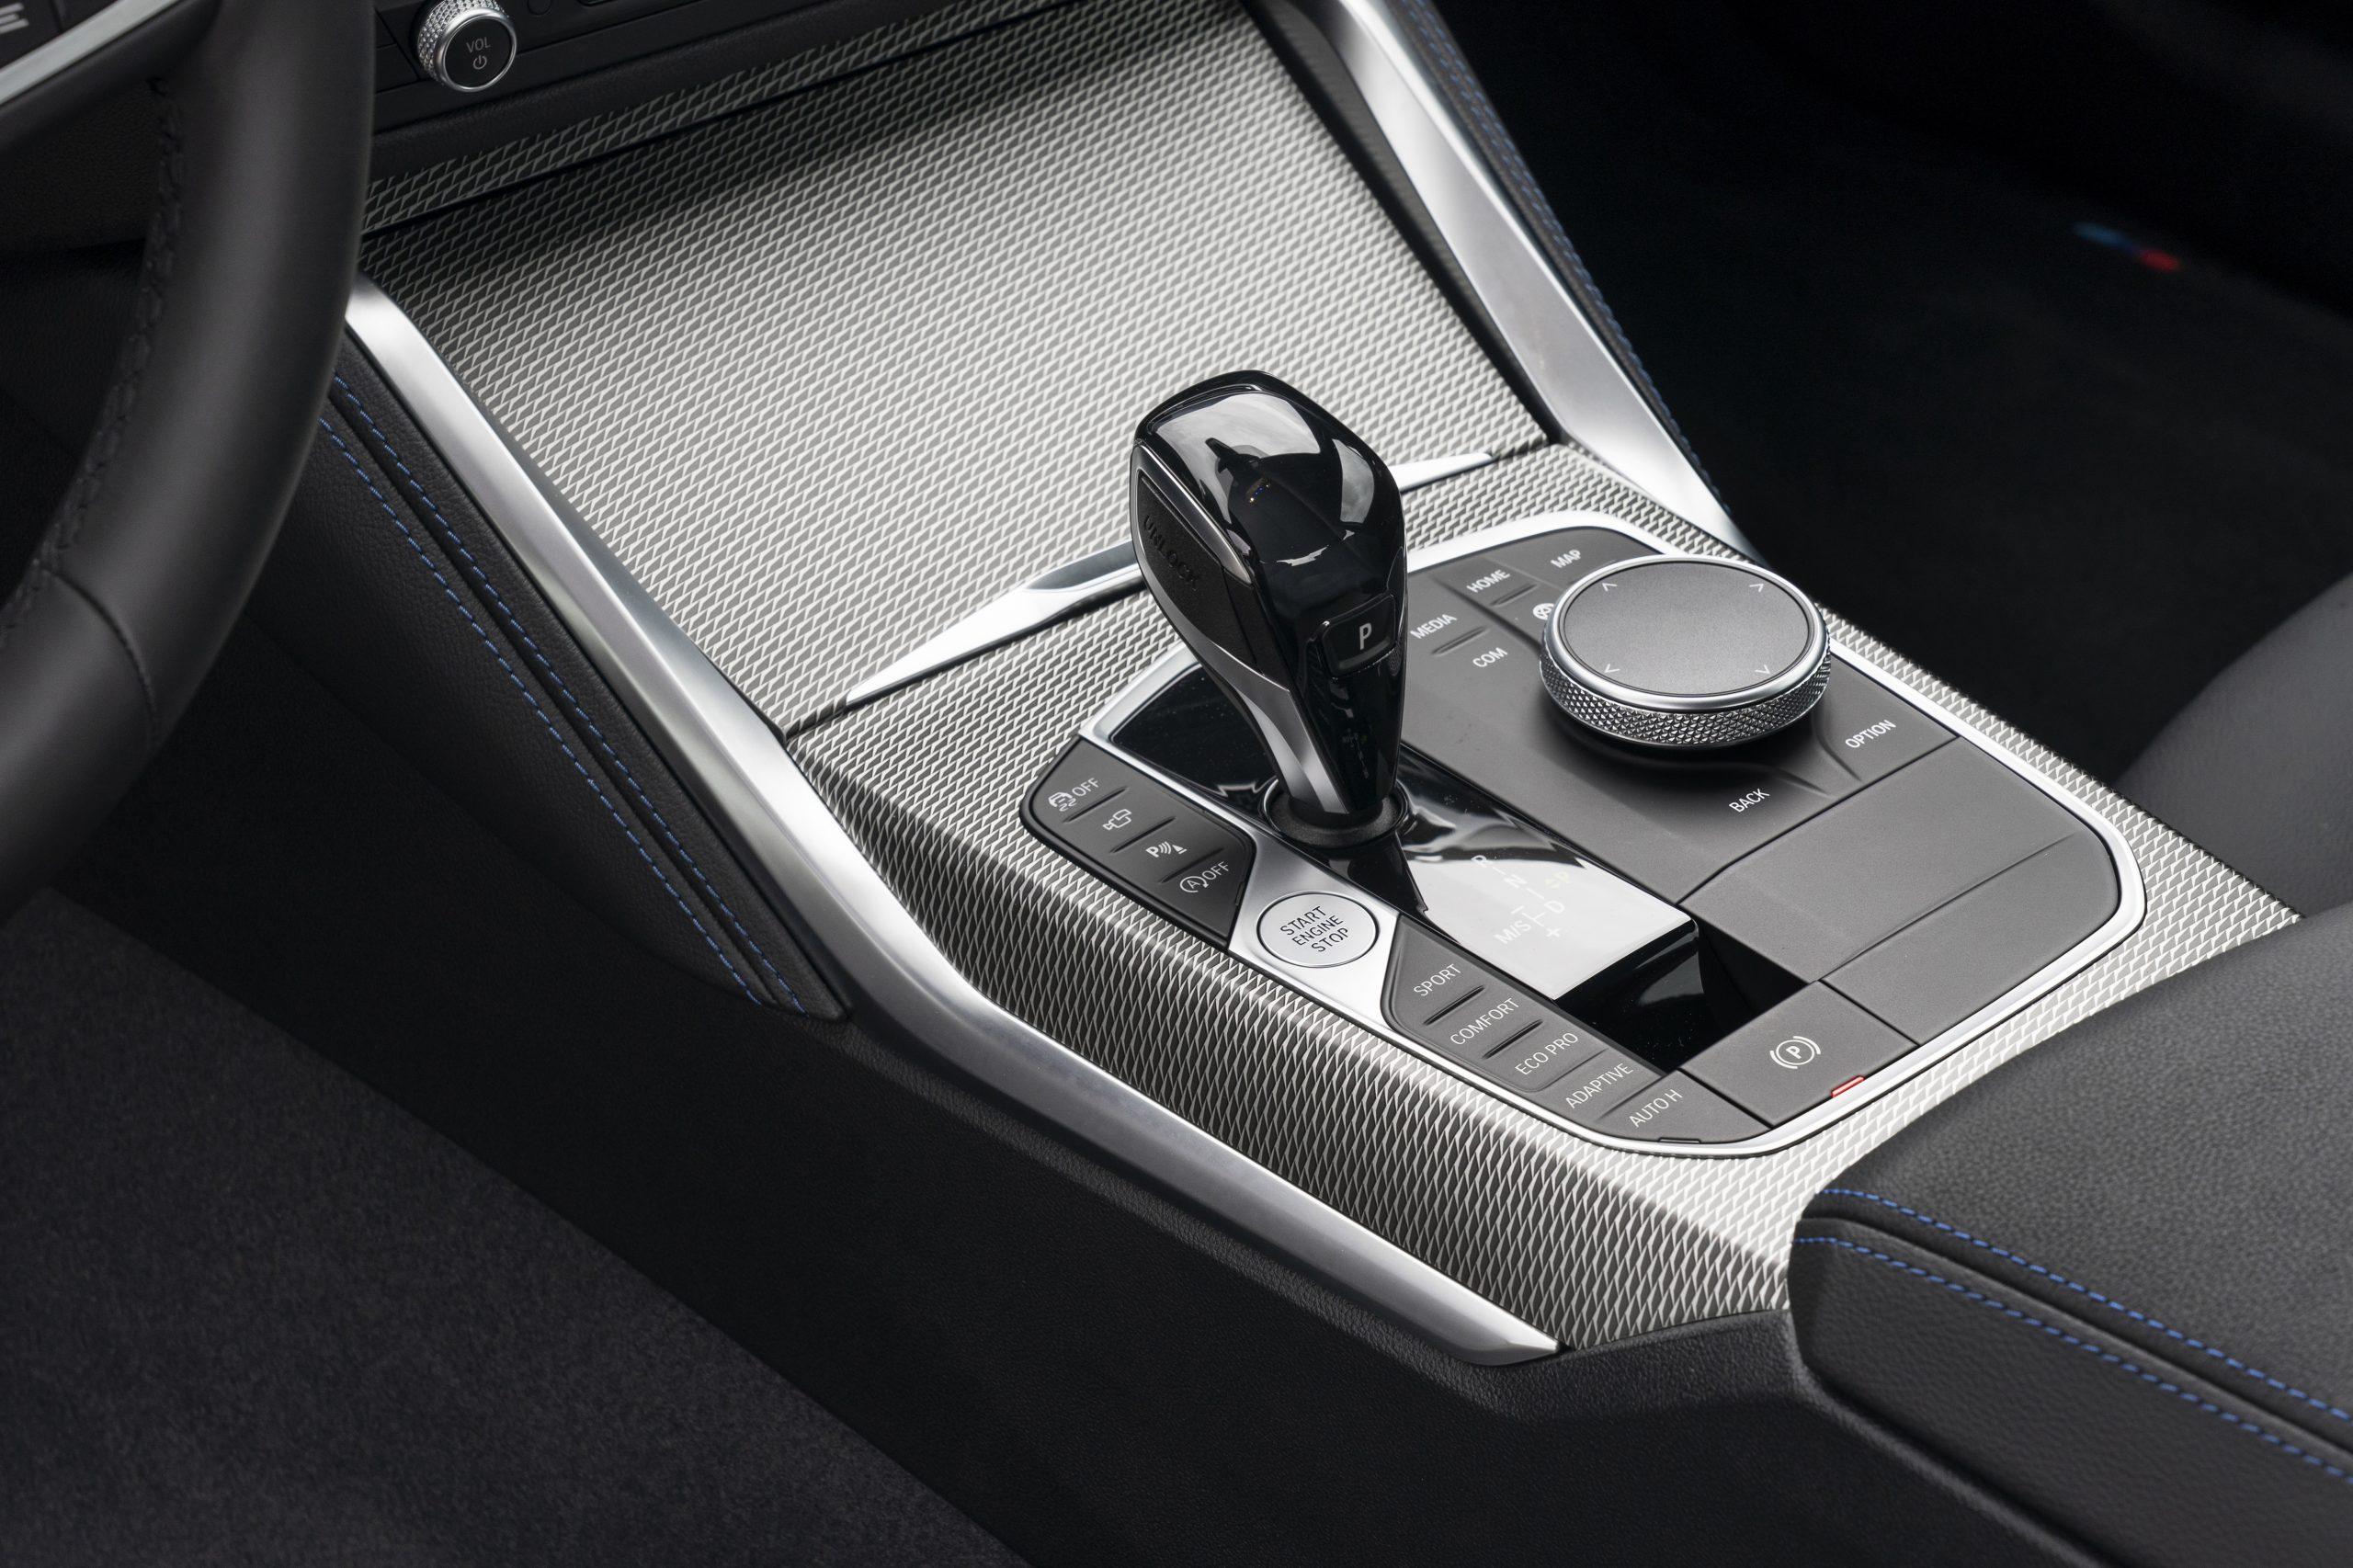 P90428482 highRes scaled Αυτή είναι η νέα BMW Σειρά 2 Coupe BMW, Bmw 2, BMW Σειρά 2, zblog, ειδήσεις, Νέα, Σειρά 2